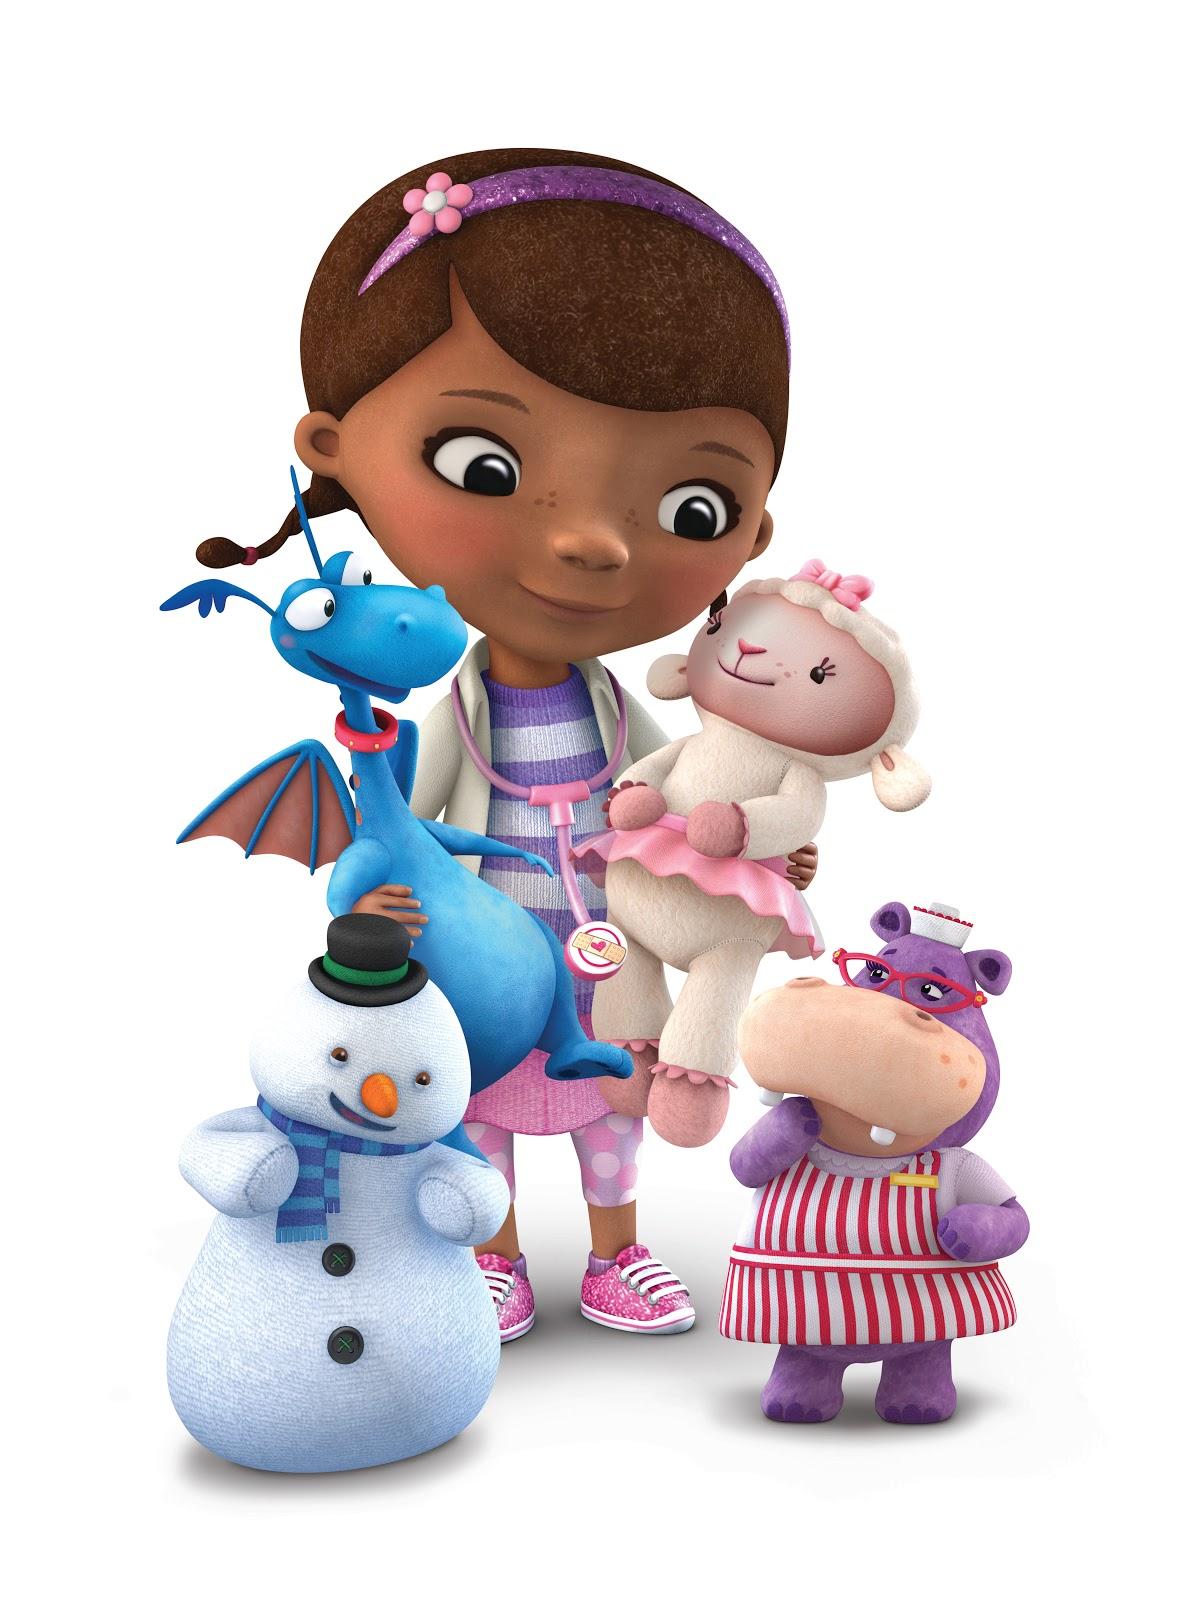 Doc mcstuffin stuffy character clipart png stock 1000+ images about Doc McStuffins on Pinterest | Disney, Doc ... png stock